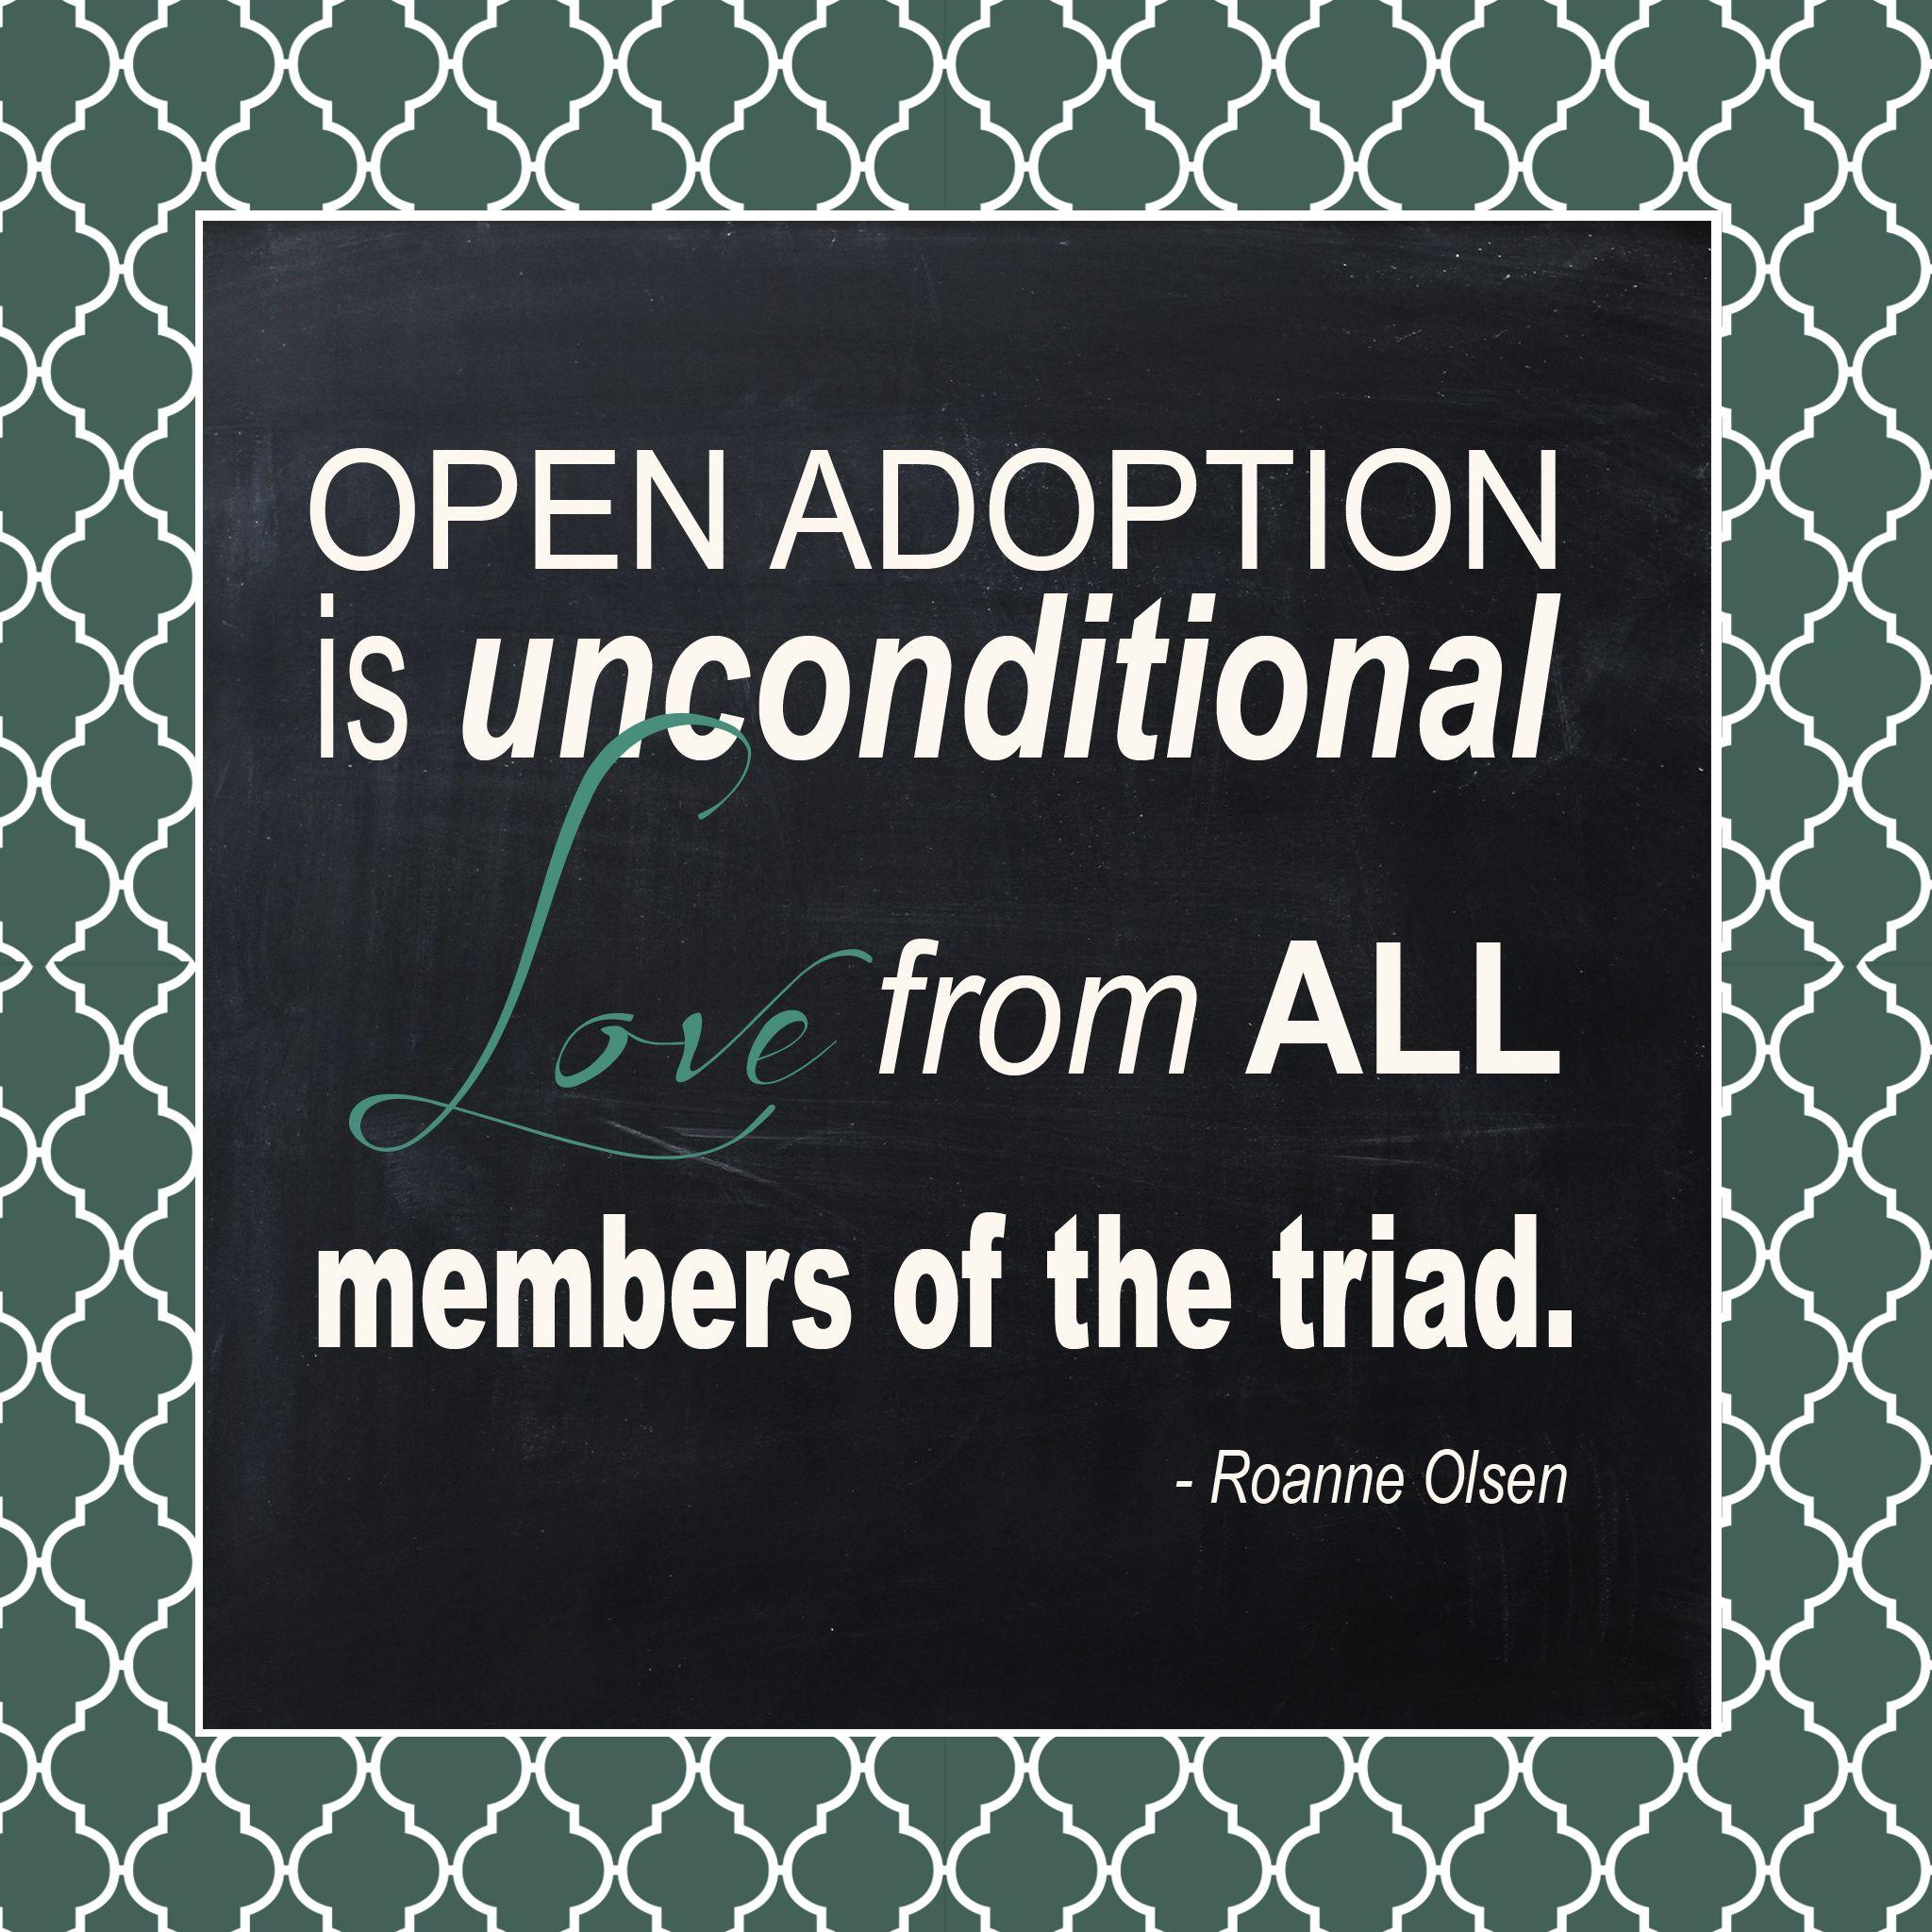 Quotes About Adoption Custom Adoption Quote#adoption #openadoption #adoptionquotes .